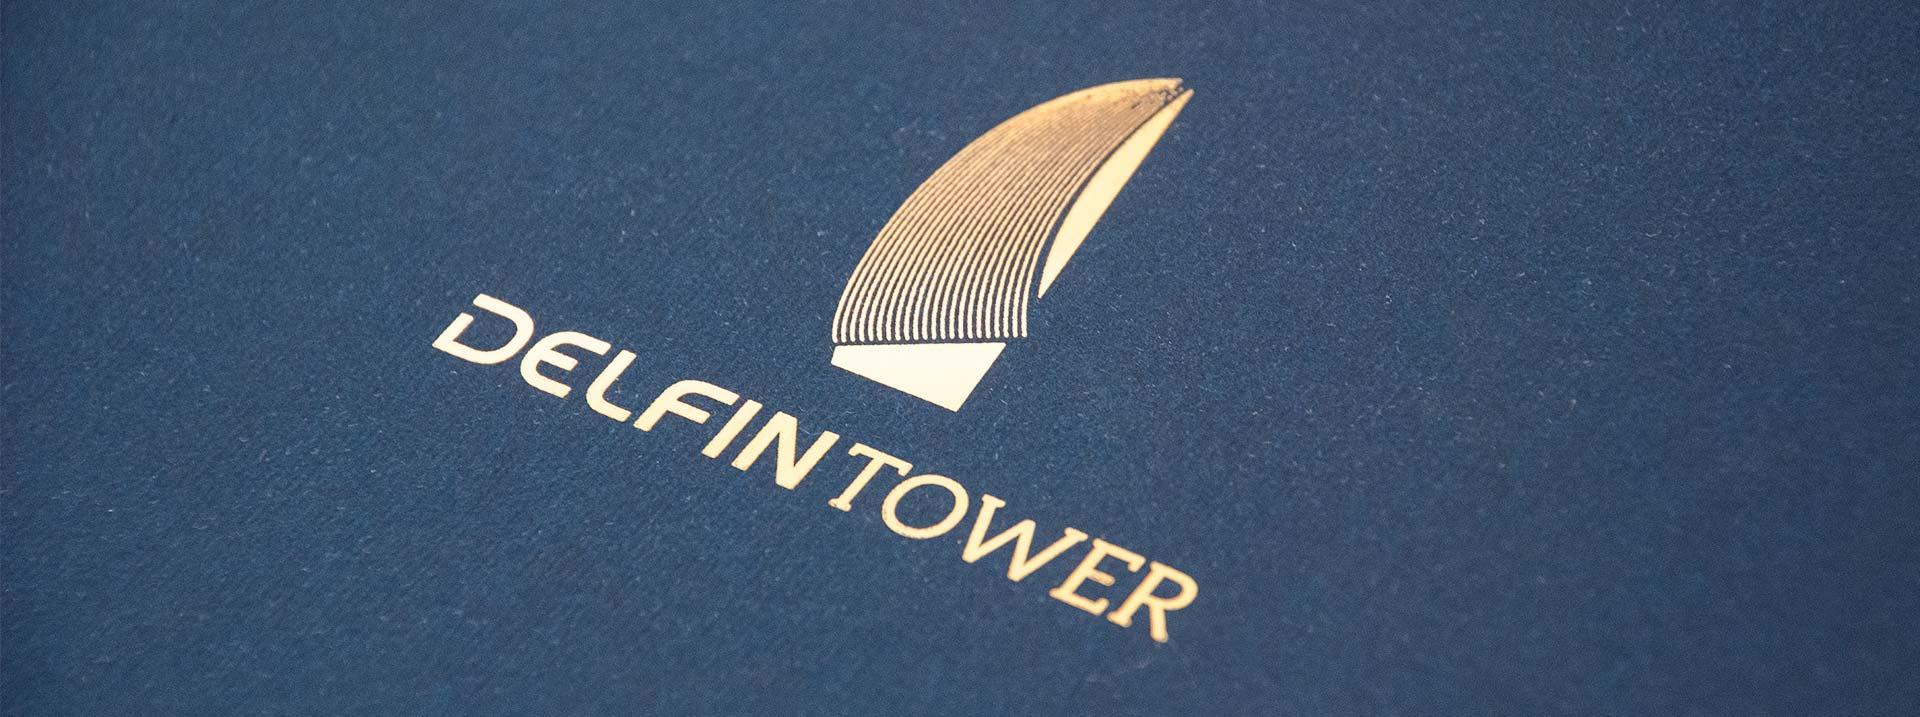 giset design delfin tower logo stamping oro